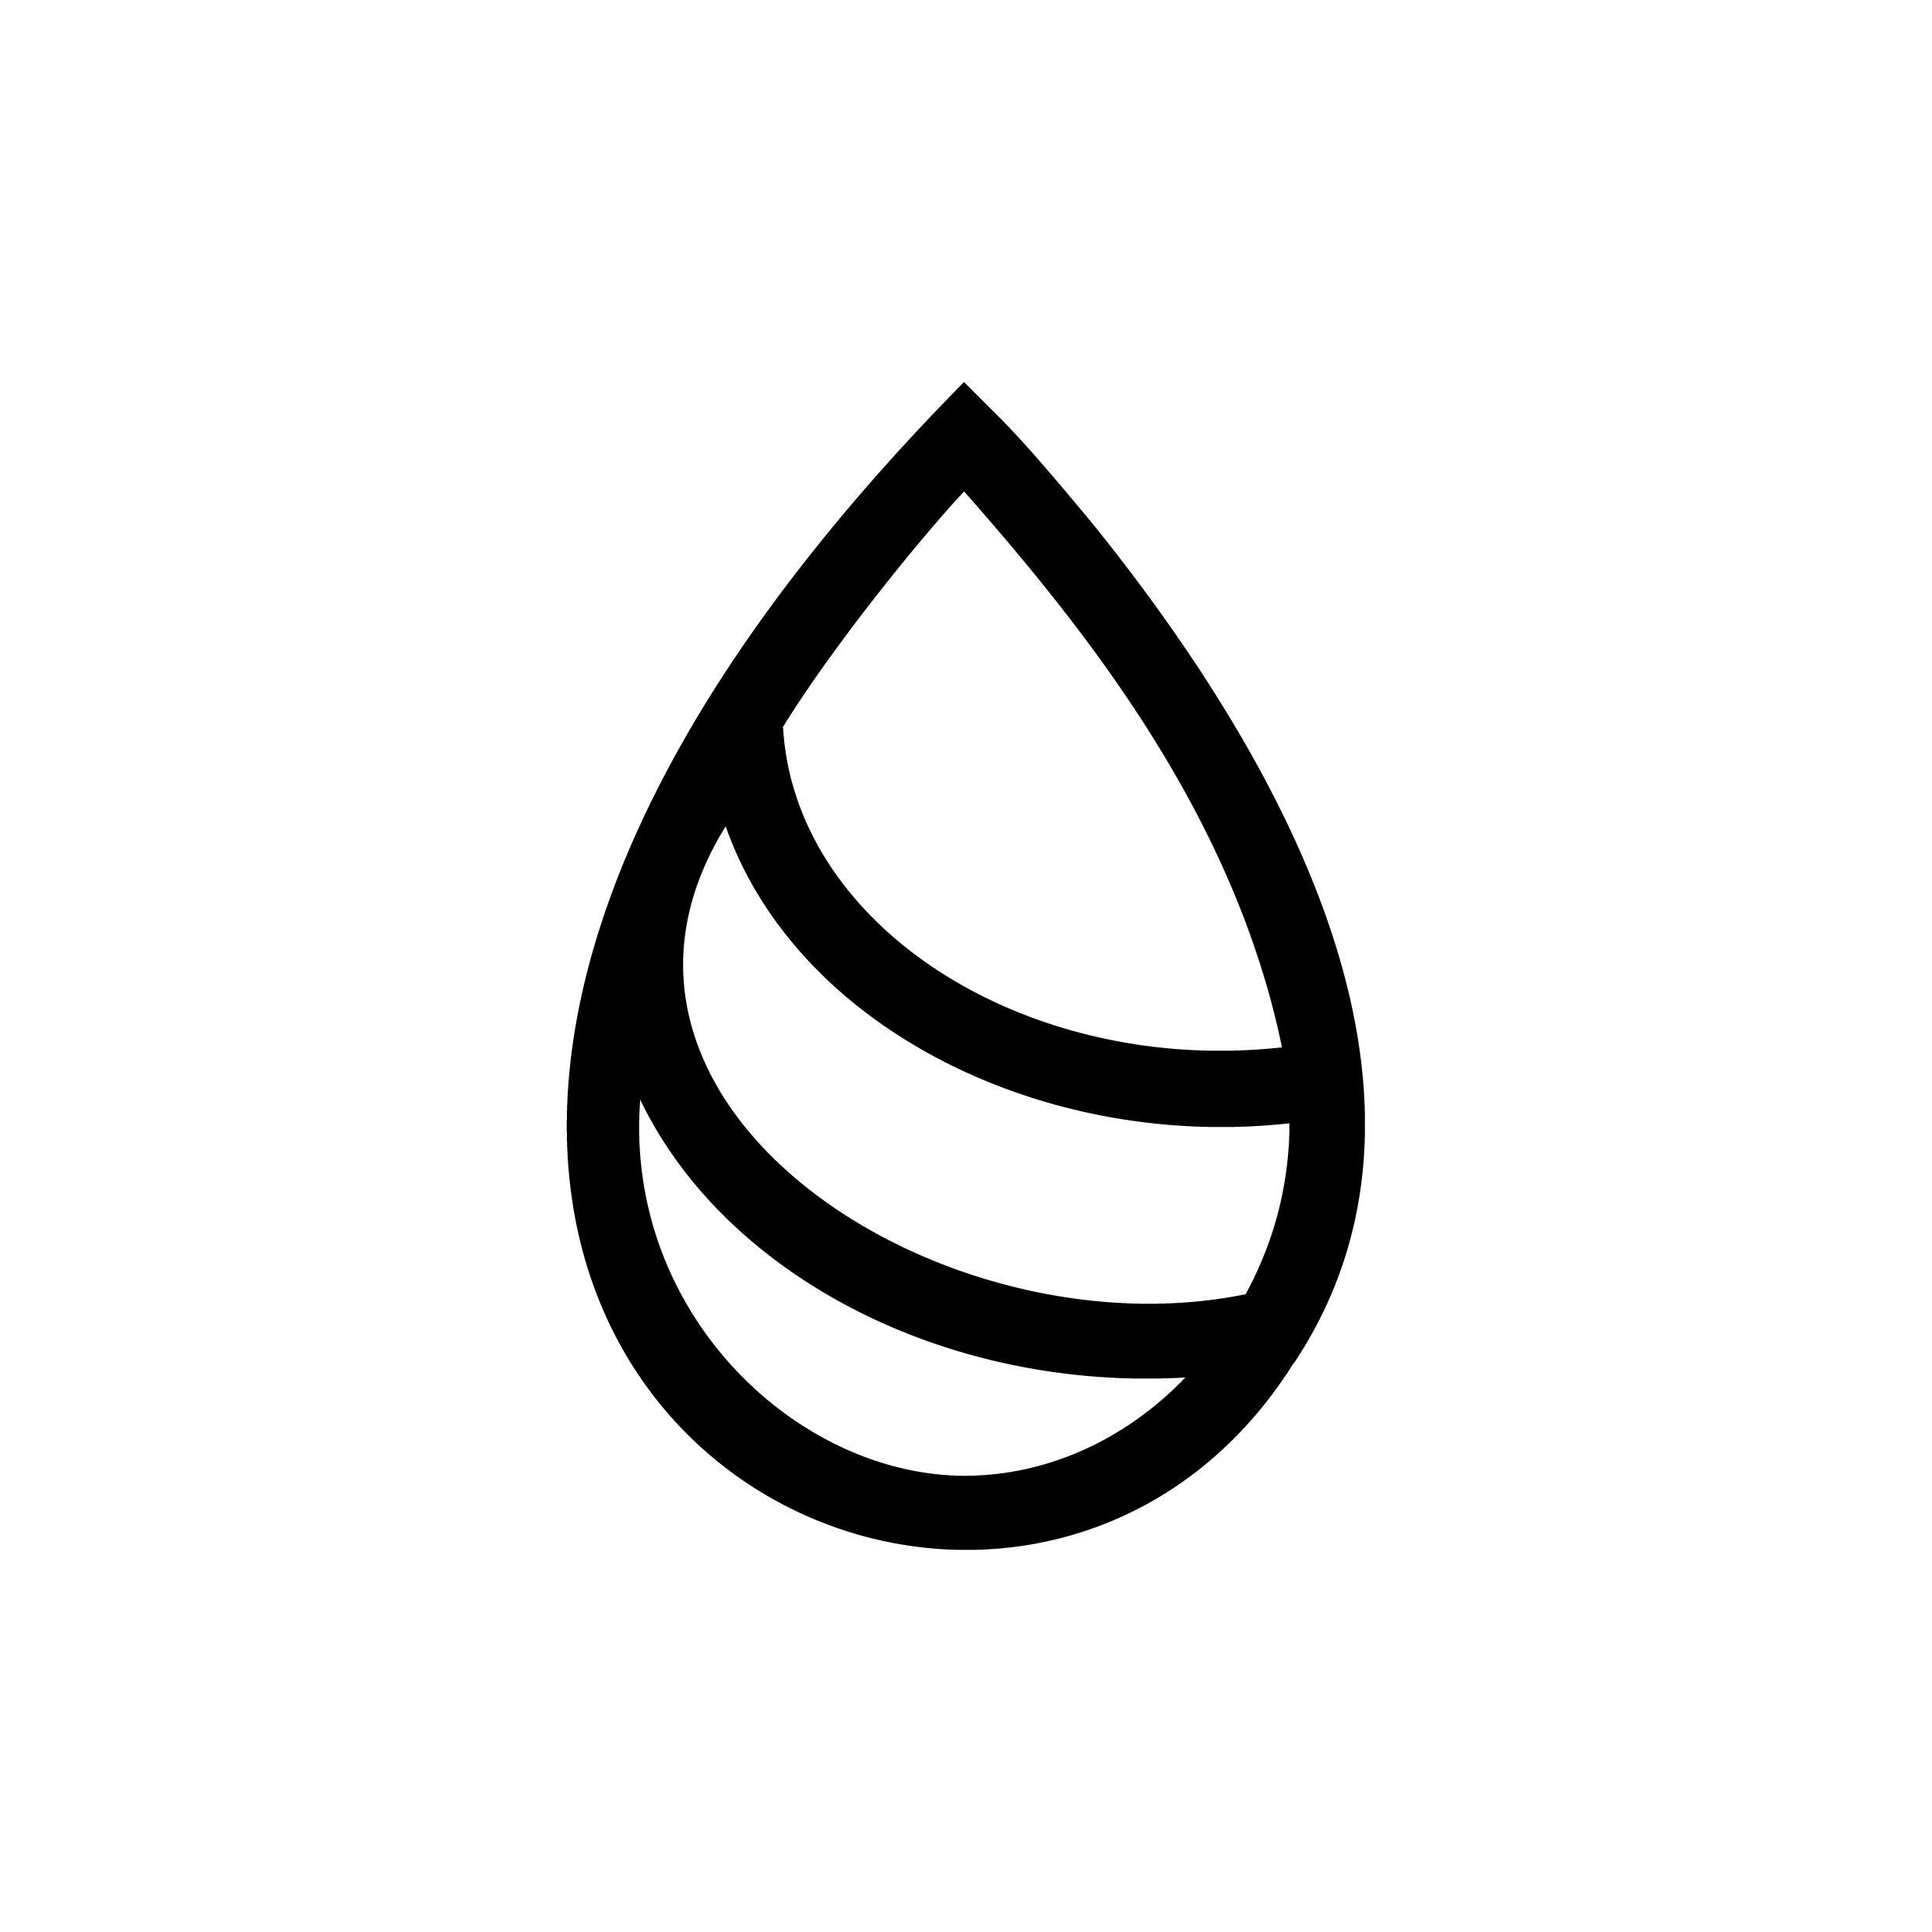 Tycon Plumbing black logo